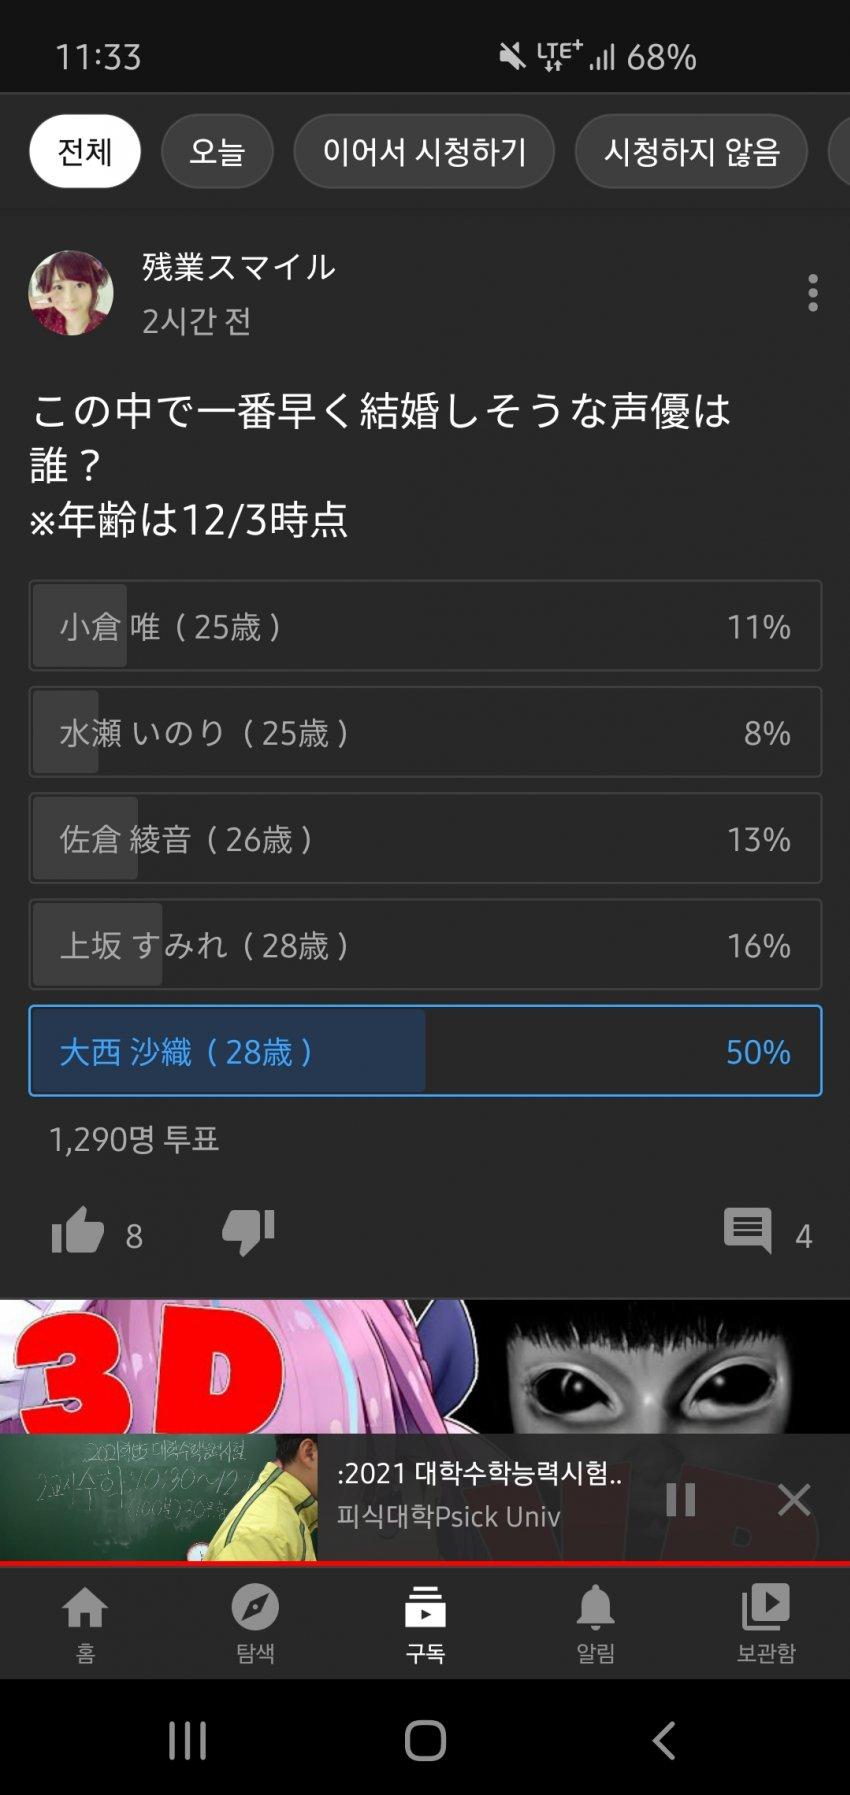 viewimage.php?no=24b0d769e1d32ca73cec84fa11d028316f6e59db3d00f81430124e7064ec96505dbacd8c9512e30b458415d86e03855914e7b6b46a1fec878b4b9ef99e7b4c084aaa9a367194222d24710def991c0f5a500cfb40282b3633494be6058a7bdc9c0f5f59